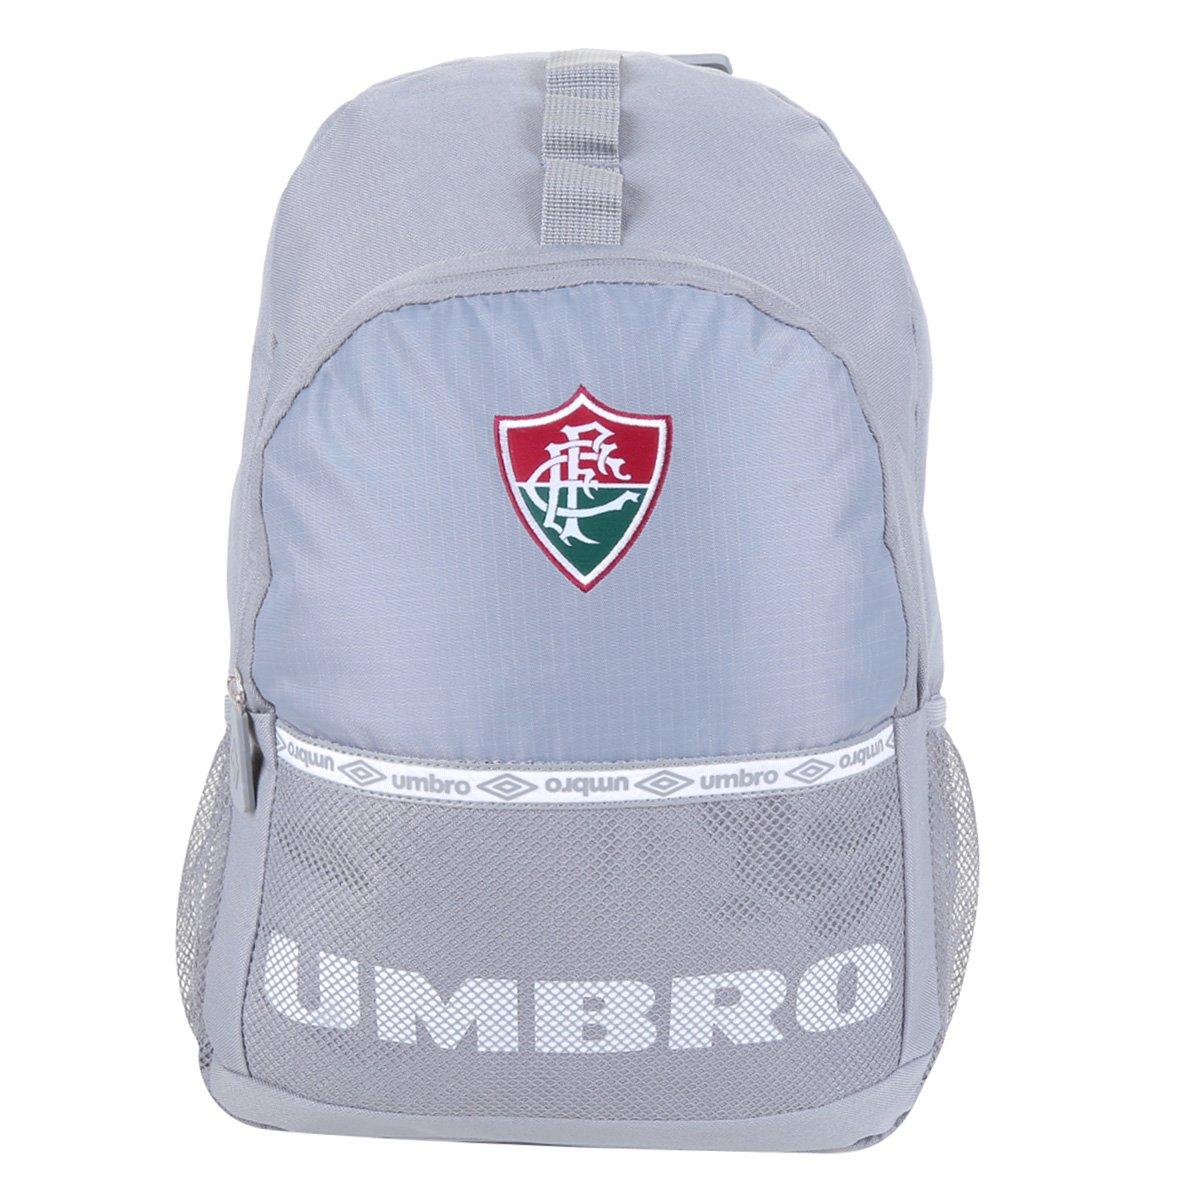 Mochila Fluminense Umbro Clubes 2021